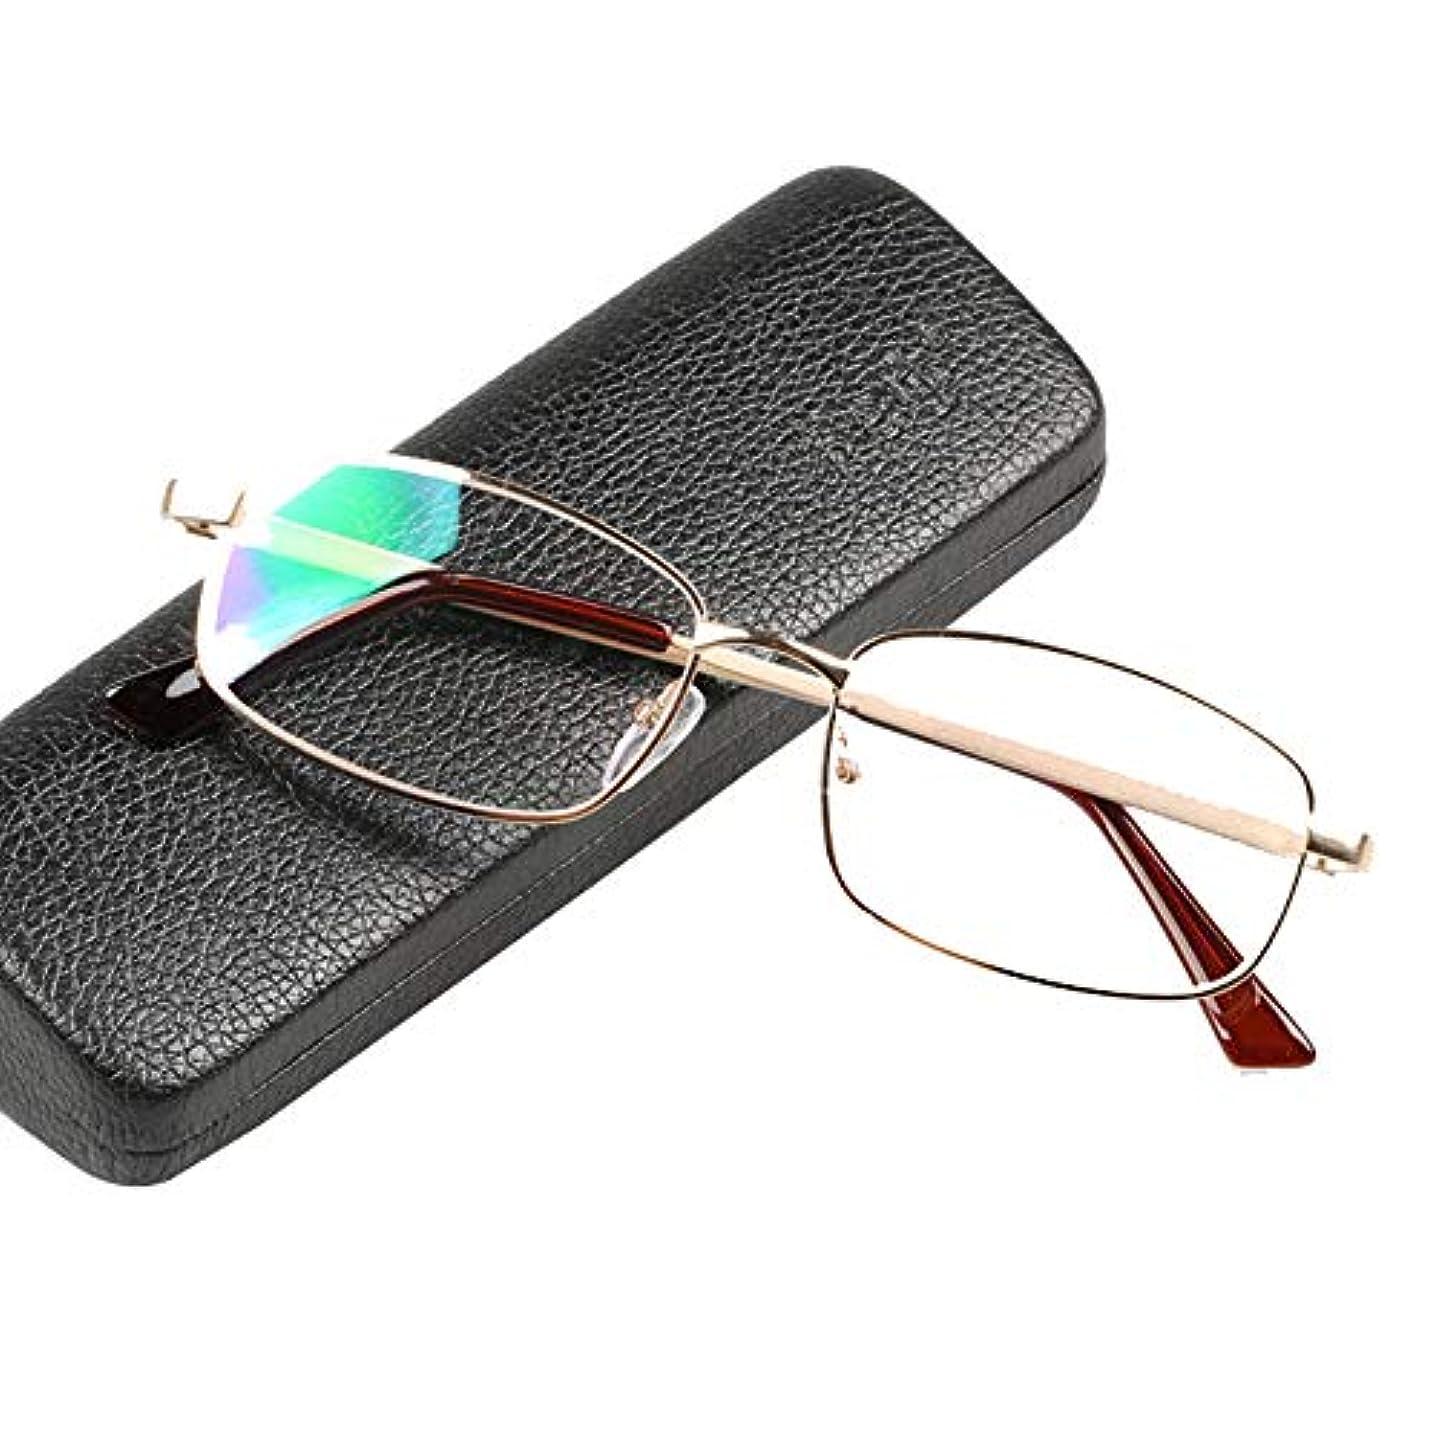 YYQ 老眼鏡、シルバーのコンピューターリーダー、男性と女性用のメタルフレームゴーグル、HDレジンレンズ、携帯用メガネケース付き、視度(+1.0)